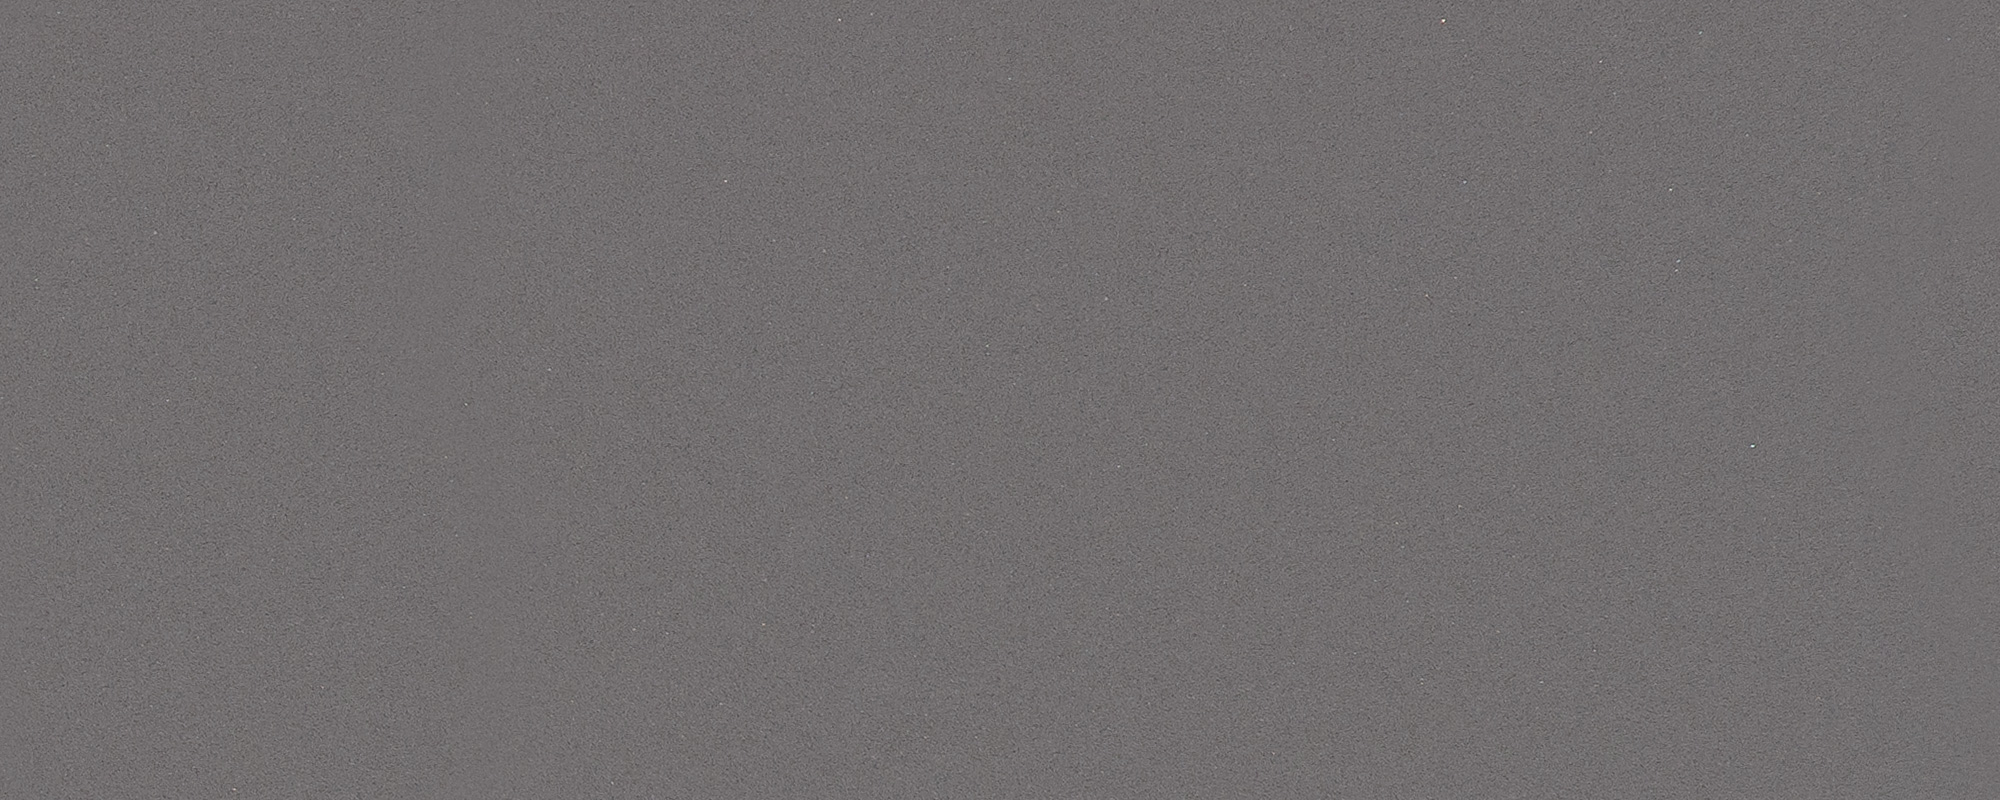 compac-smoke-gray-pulido-cabecera-1